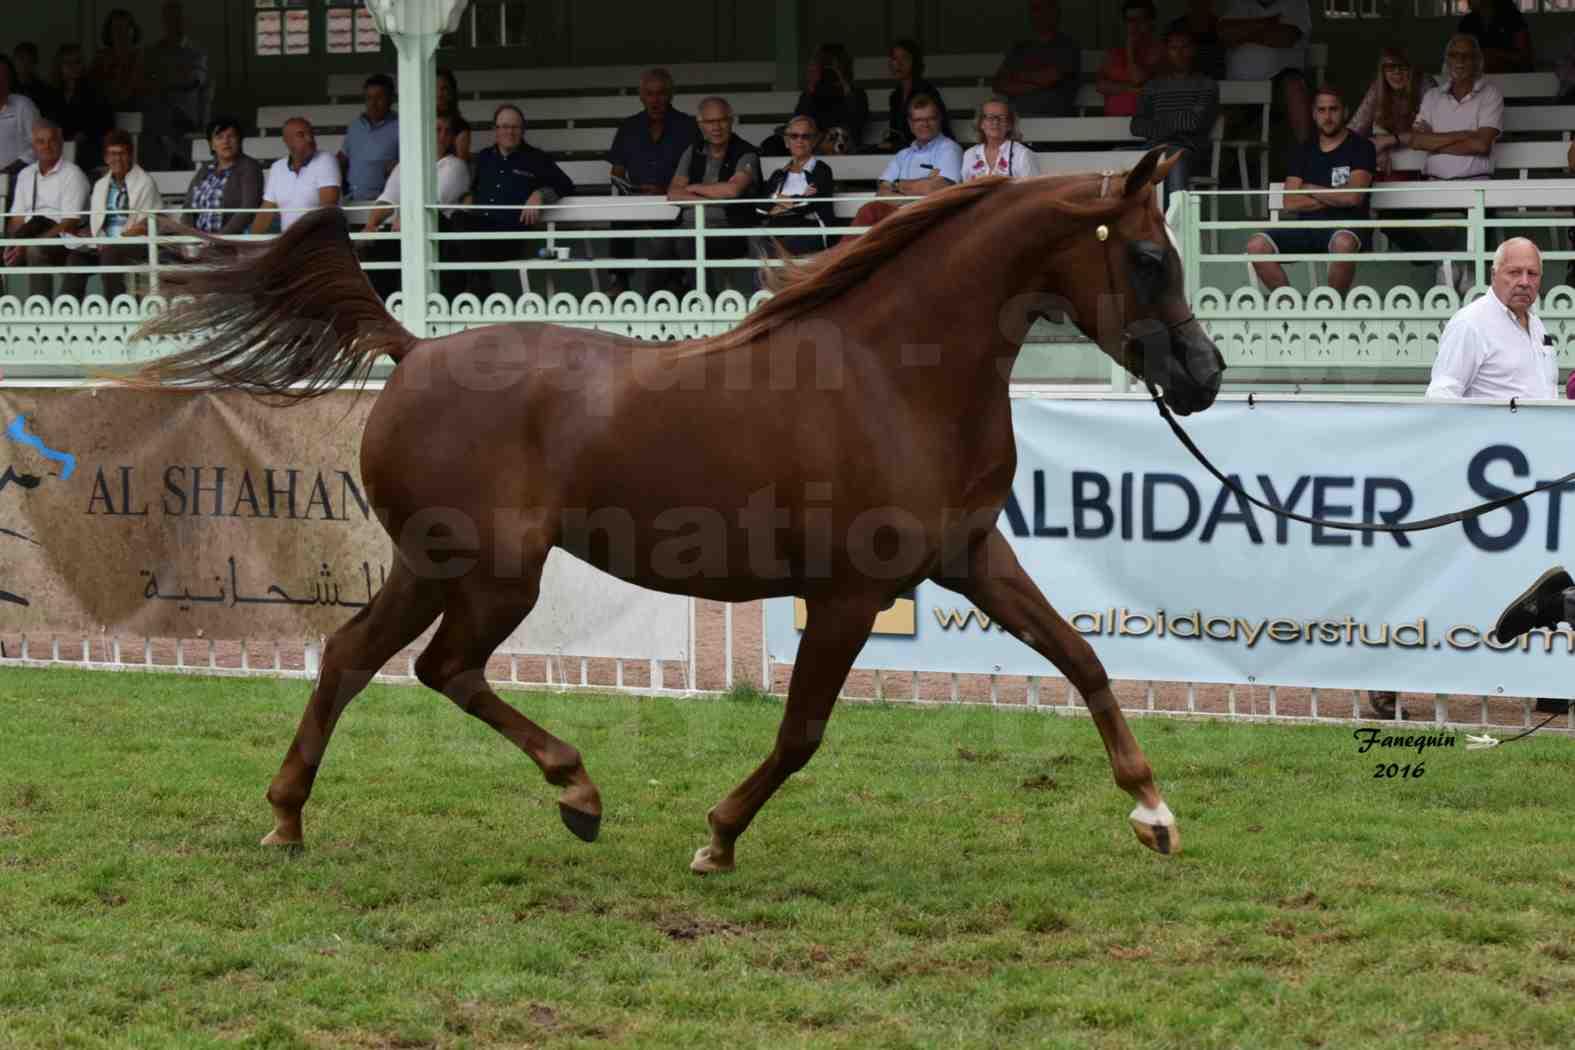 International Arabian Horse Show B de VICHY 2016 - PEARL DE DJOON - Notre Sélection - 05